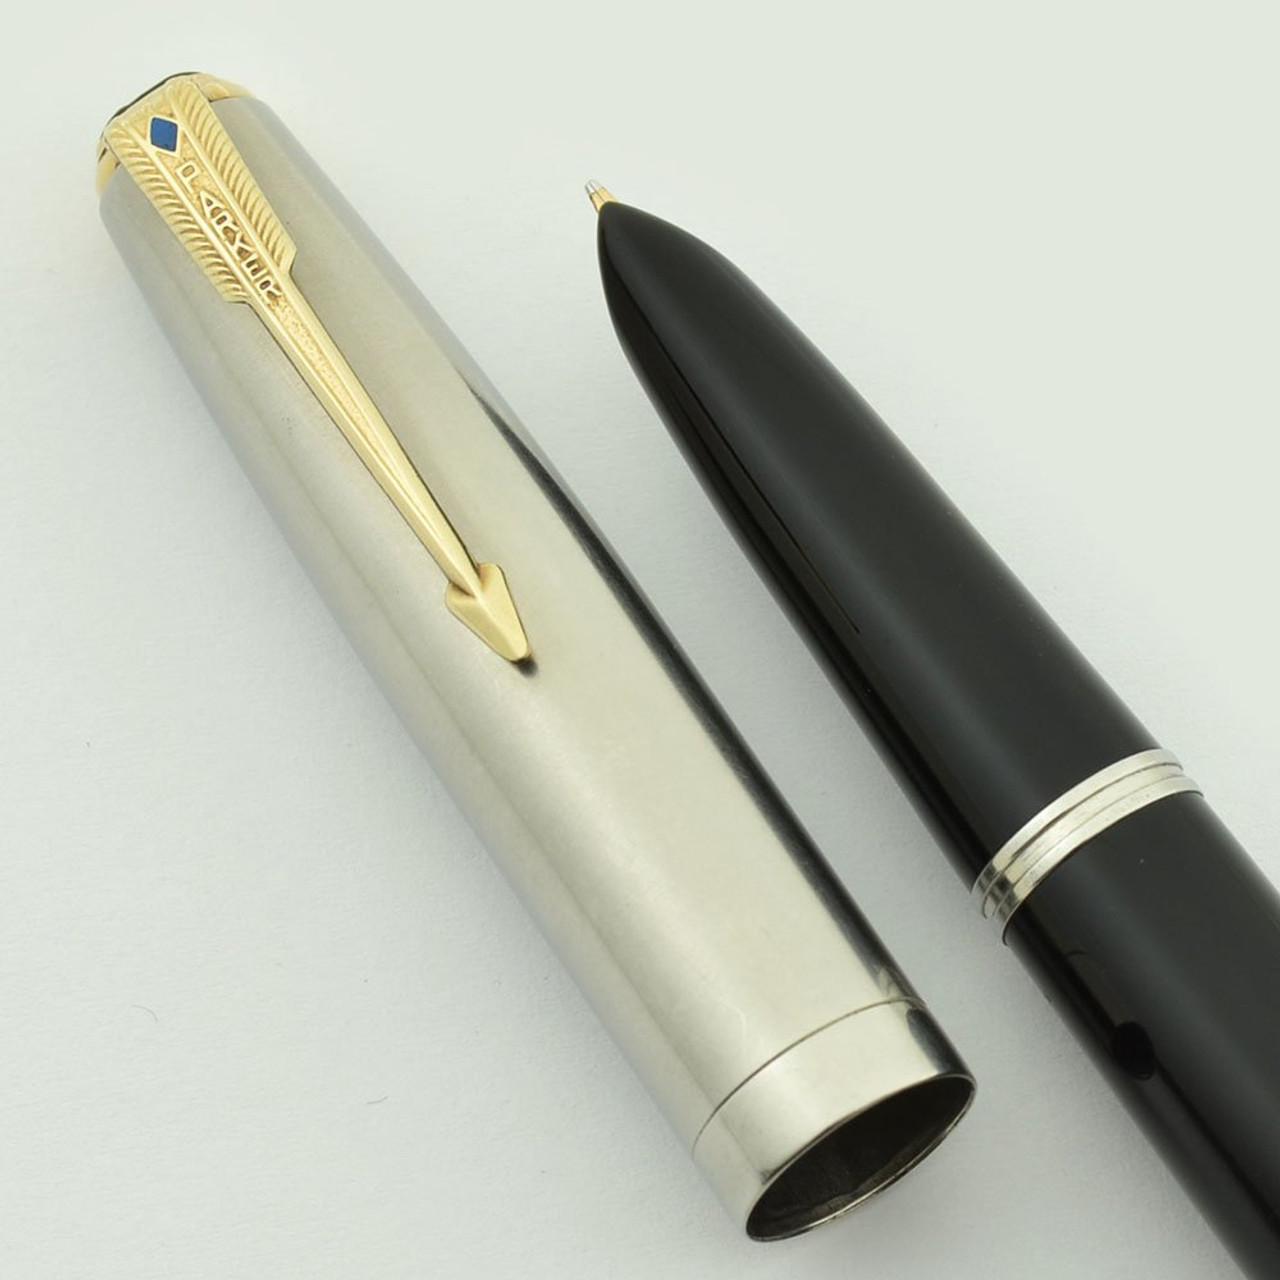 Parker Vacumatic Fountain Pen Vintage Black /& Gold Not Working 14K Nib Blue Diamond